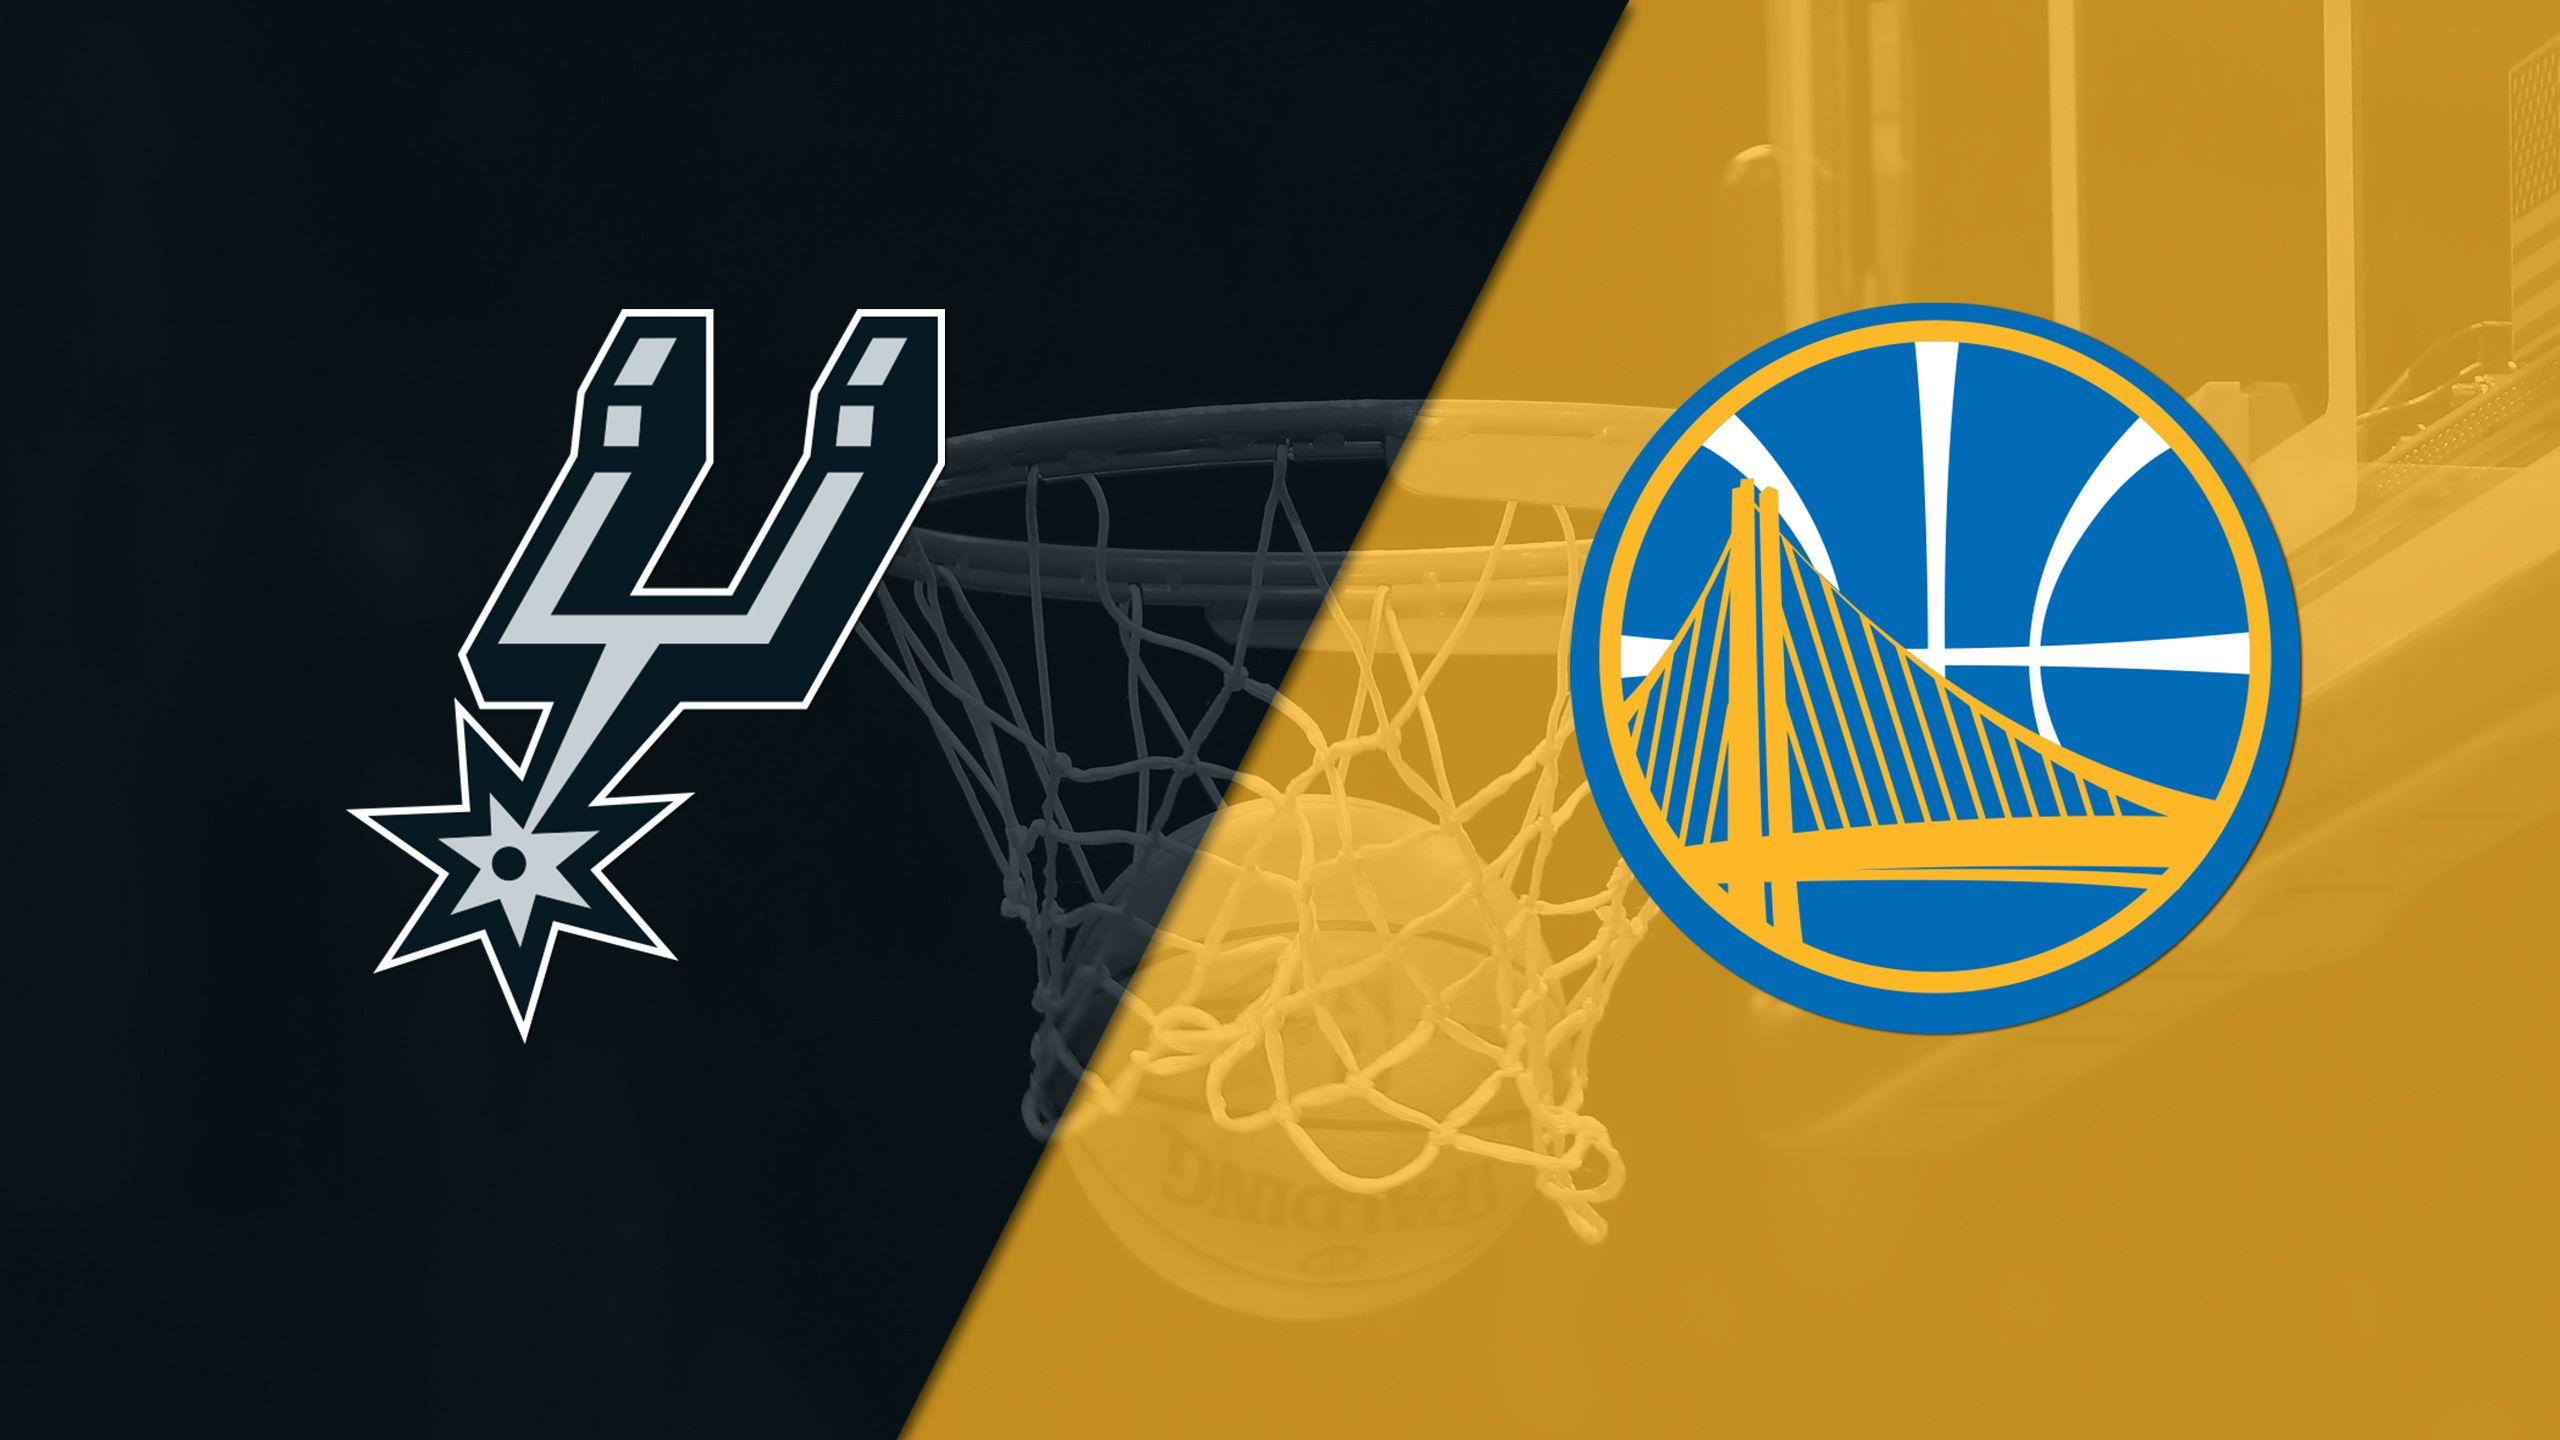 Data Center - San Antonio Spurs vs. Golden State Warriors ...